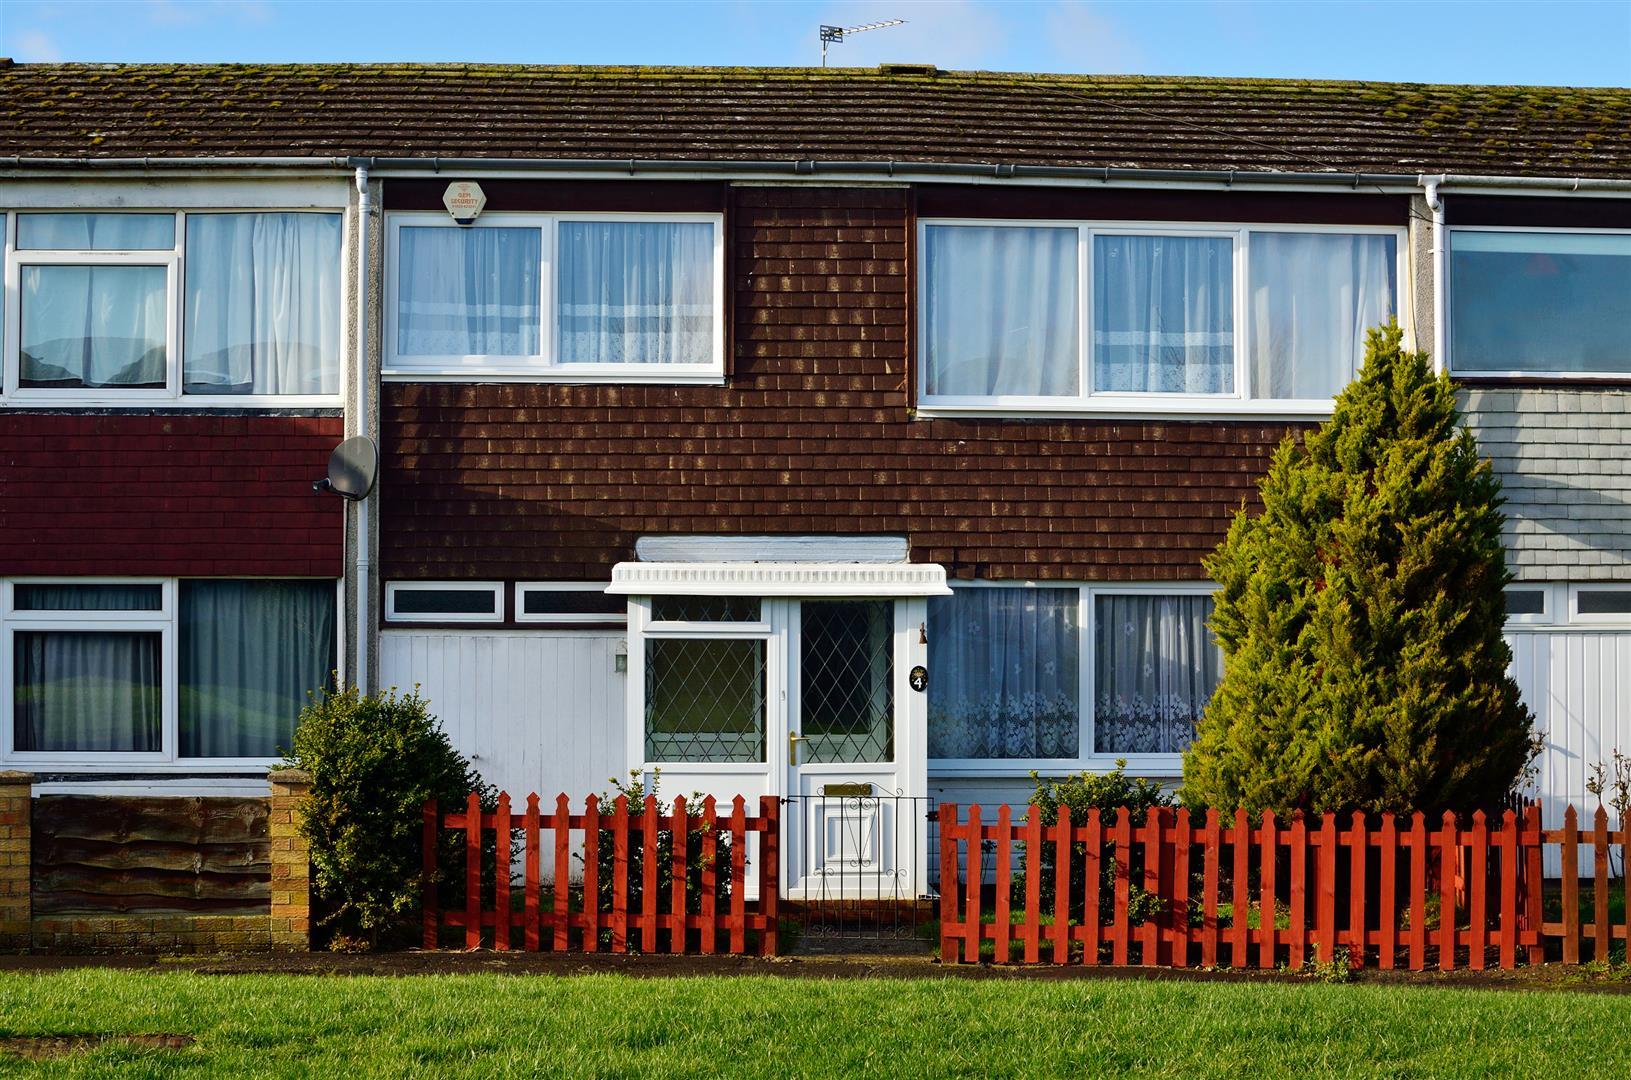 3 Bedrooms Terraced House for sale in Wakefield, Wellingborough